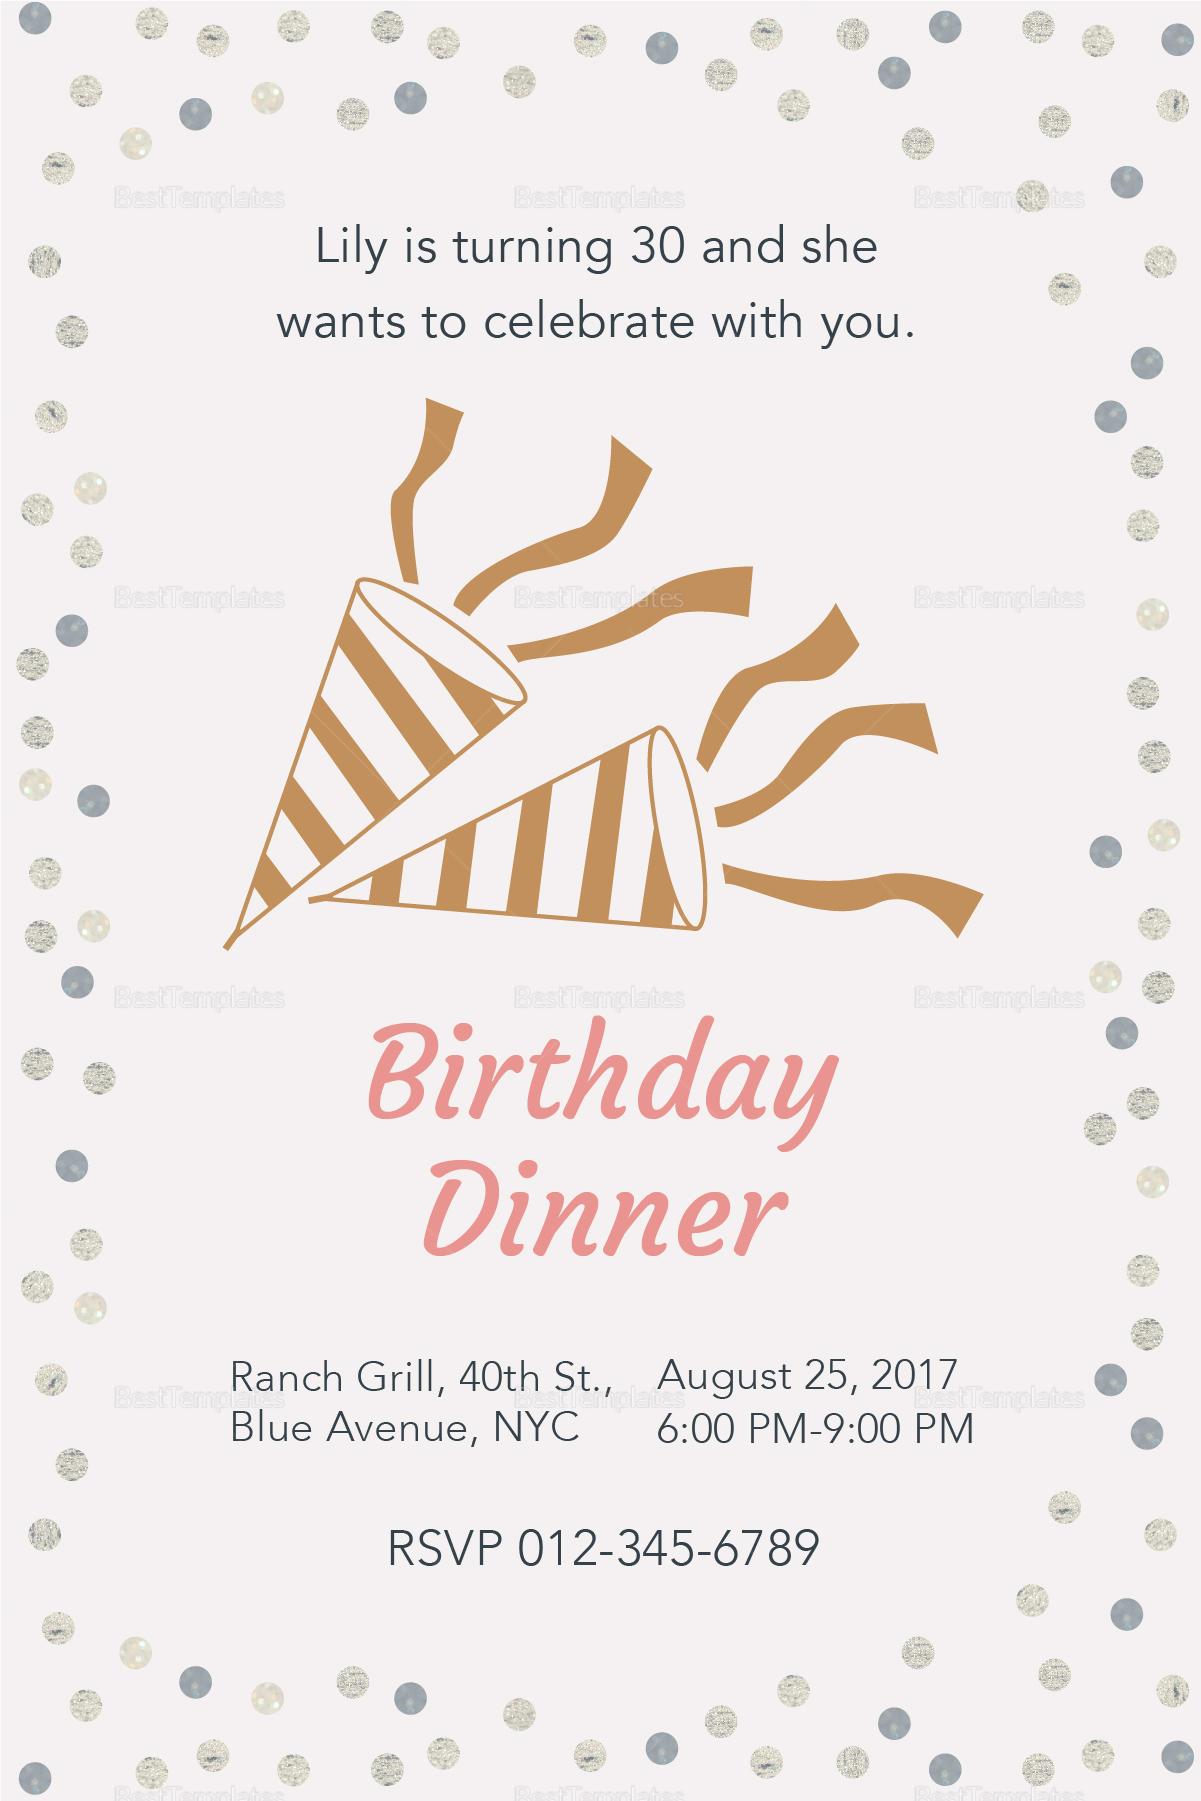 Birthday Dinner Invitation Design Template In Psd Word Publisher regarding measurements 1201 X 1801